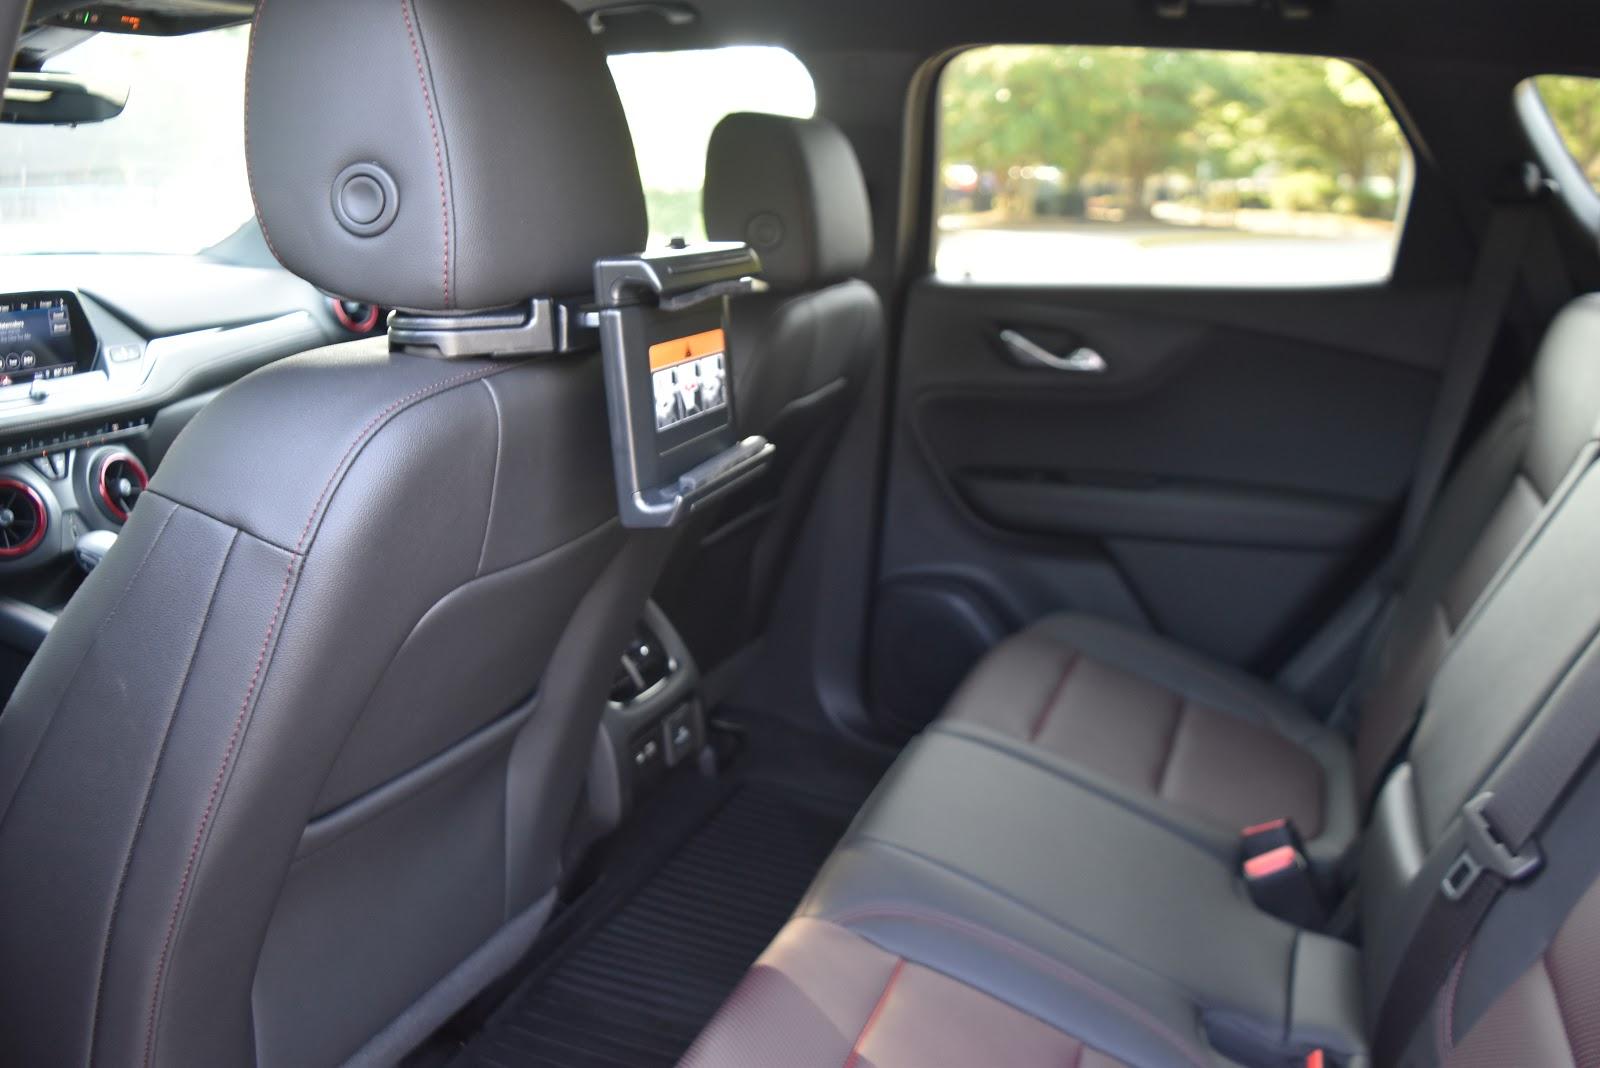 2019 Chevy Blazer Back Seat